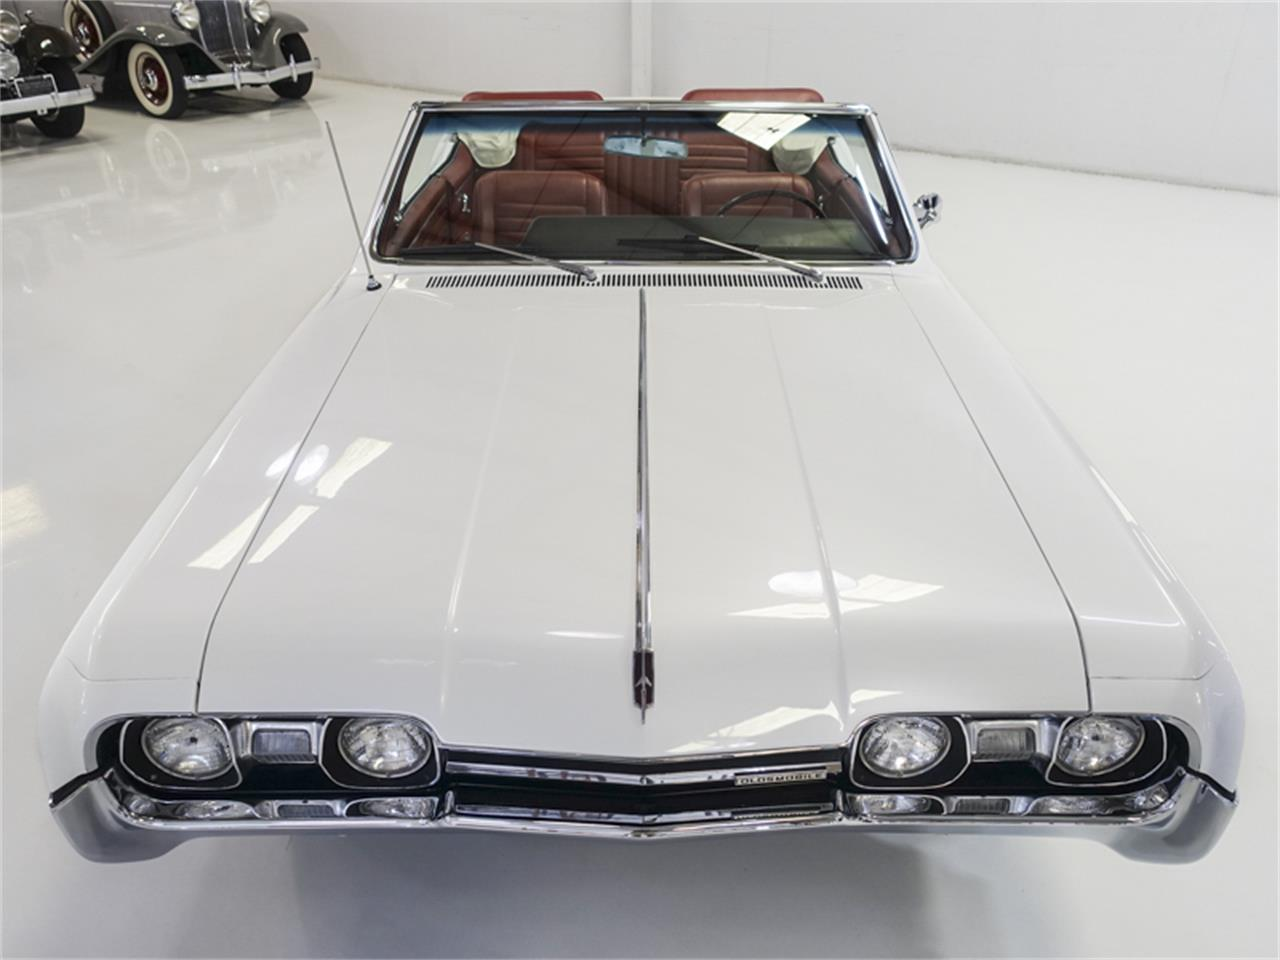 Large Picture of '67 Cutlass Supreme - $29,900.00 Offered by Daniel Schmitt & Co. - QK0F